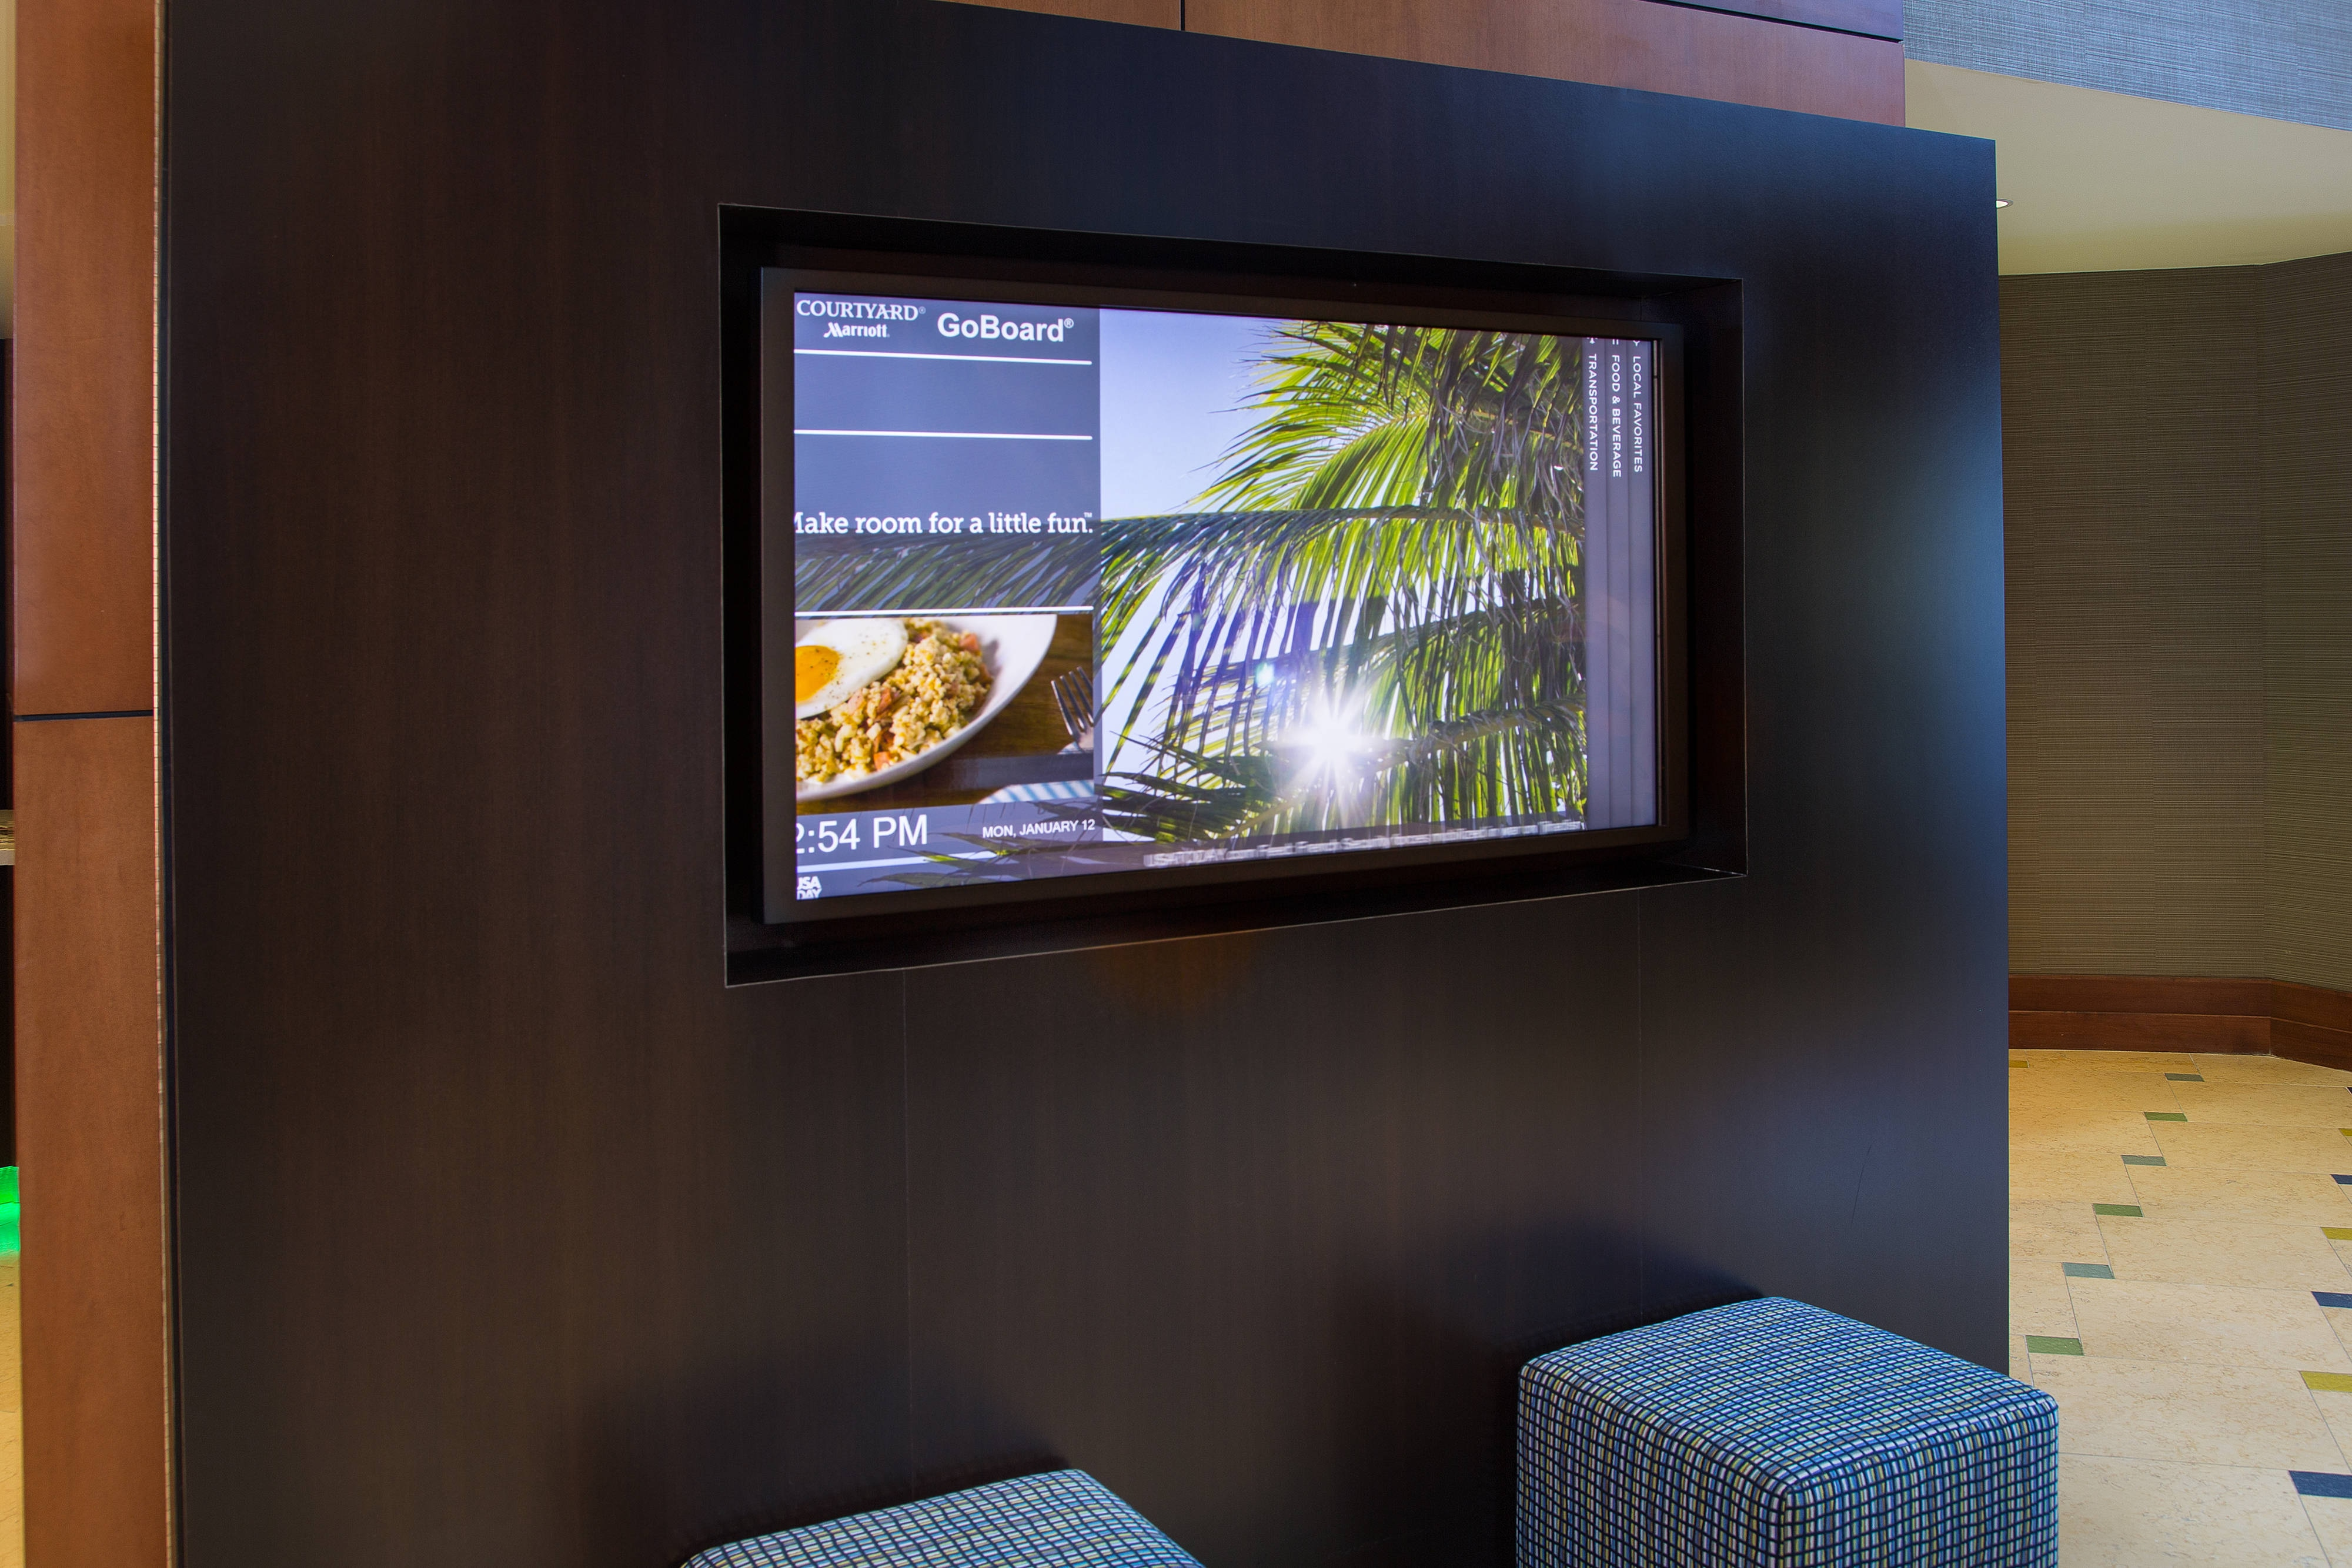 Tablero interactivo del Courtyard Fort Lauderdale Beach